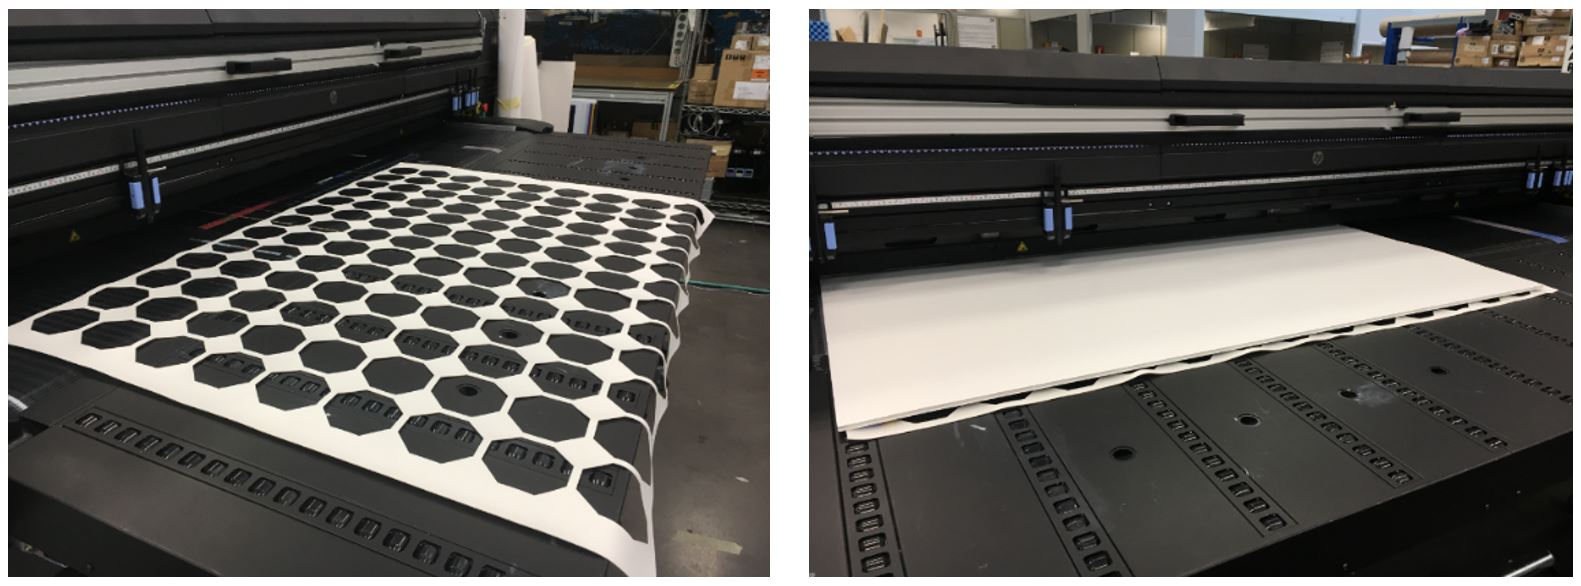 HPLatex flatbed rigid double sided printer